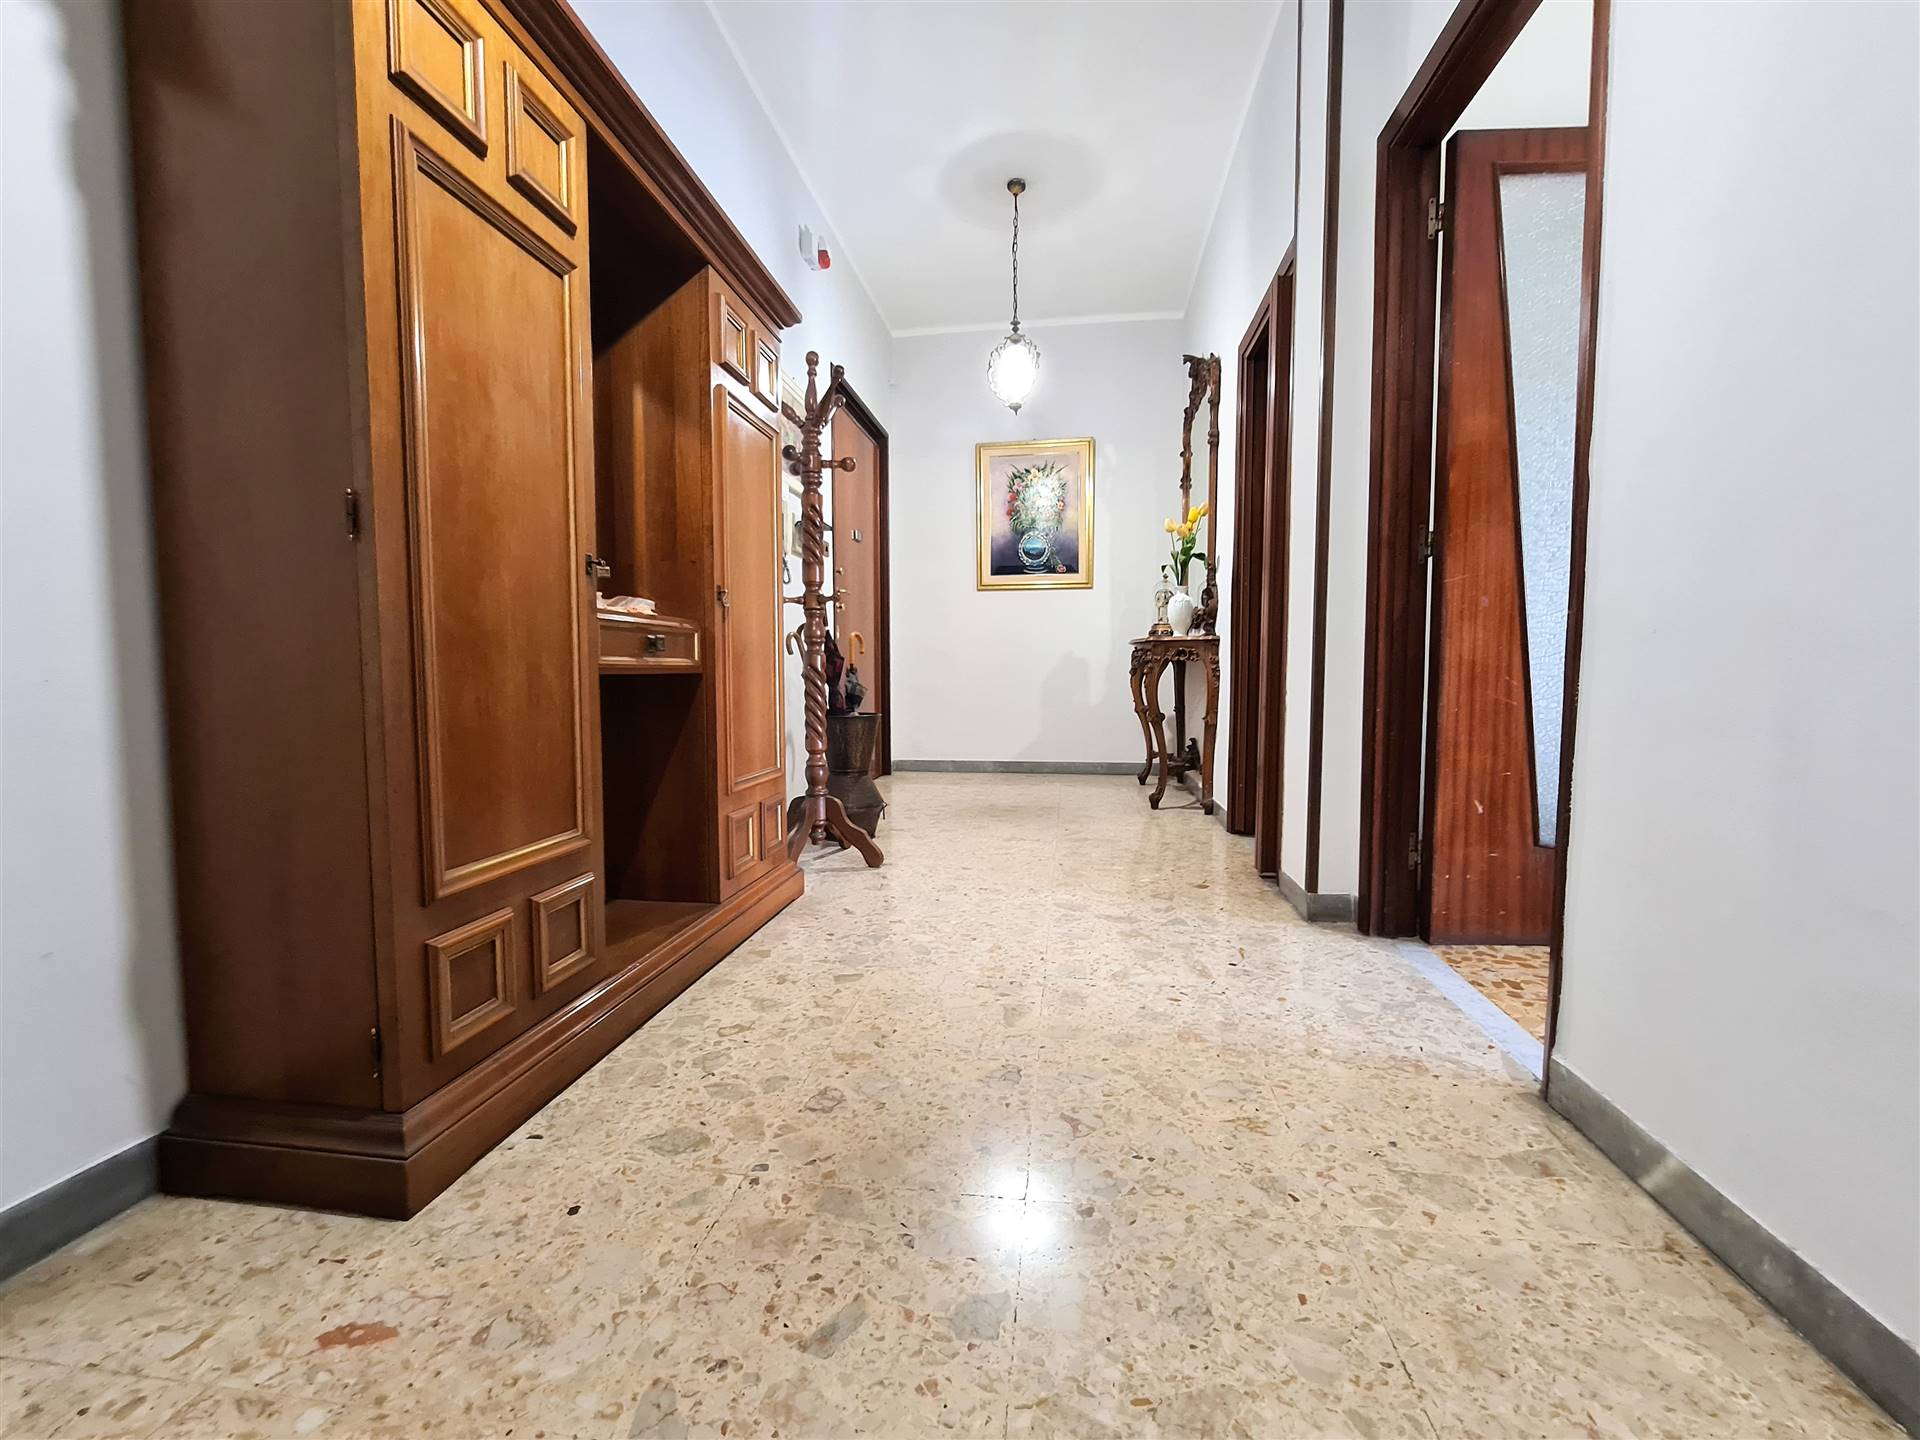 AV924C-Appartamento-SANTA-MARIA-CAPUA-VETERE-Via-Luigi-de-Michele